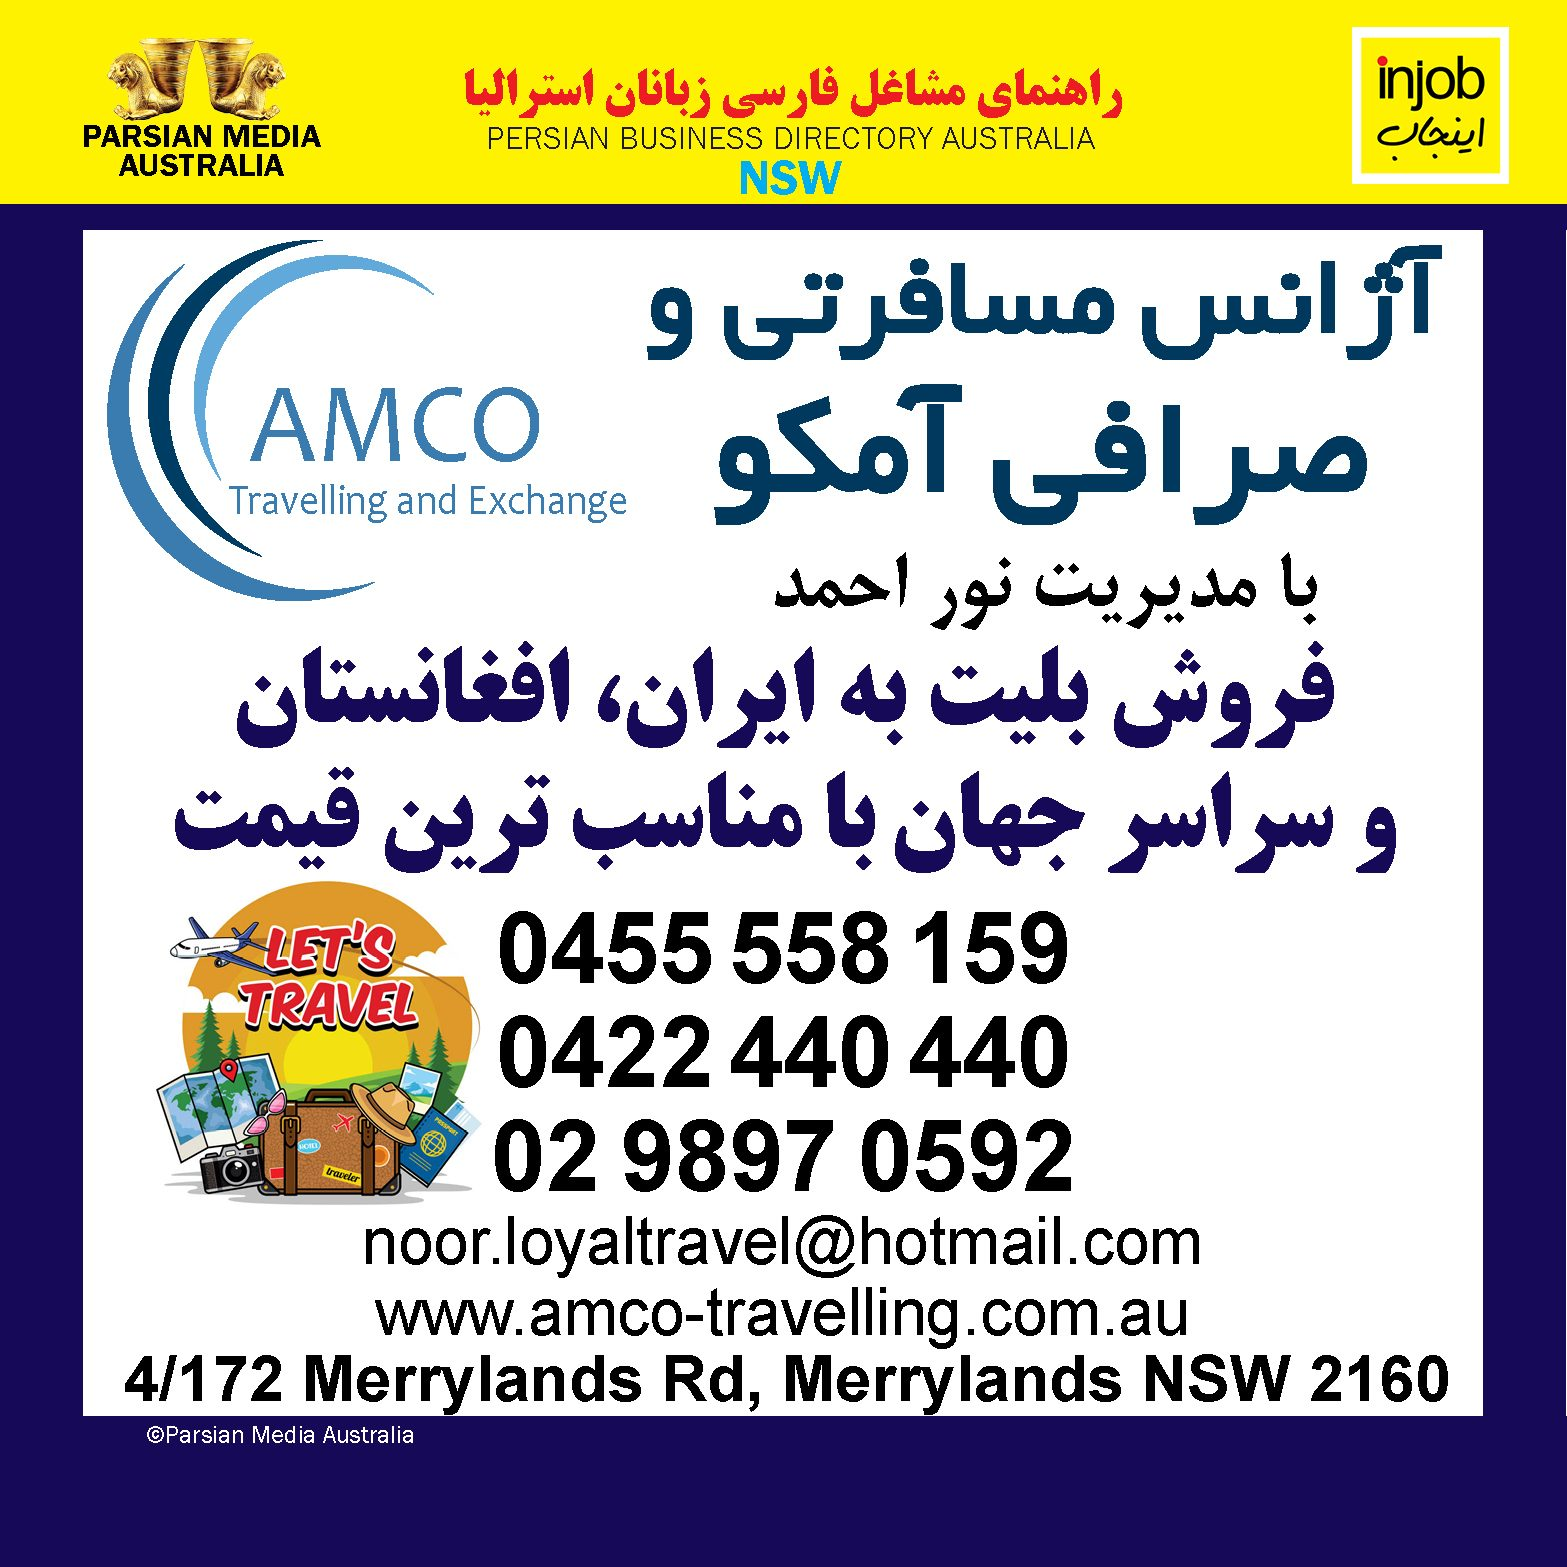 Amco-Travel Agent-Injob-2021-2022-online.jpg